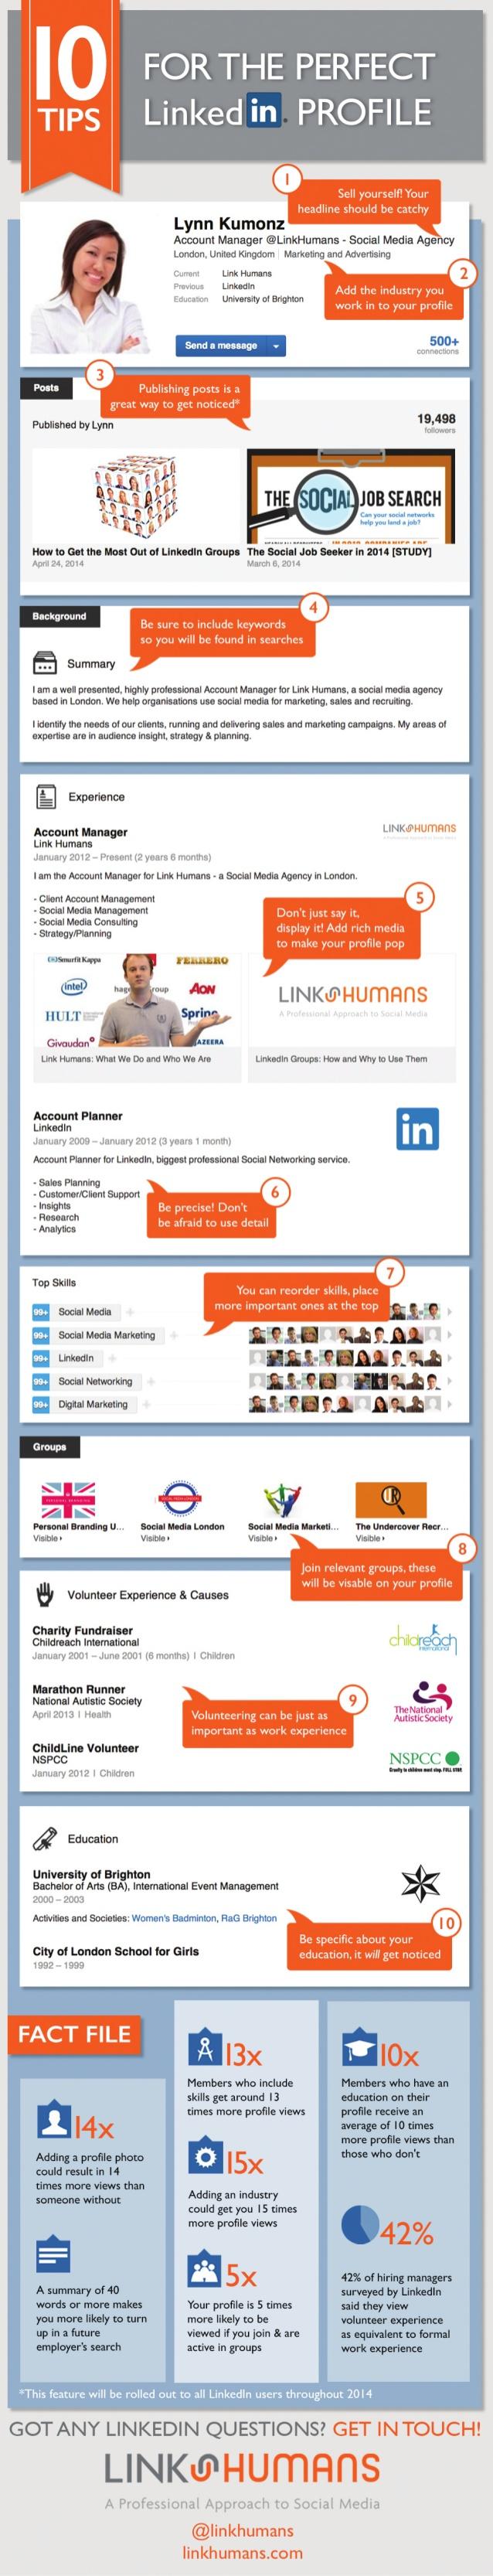 10 consejos para un perfil perfecto en Linkedin